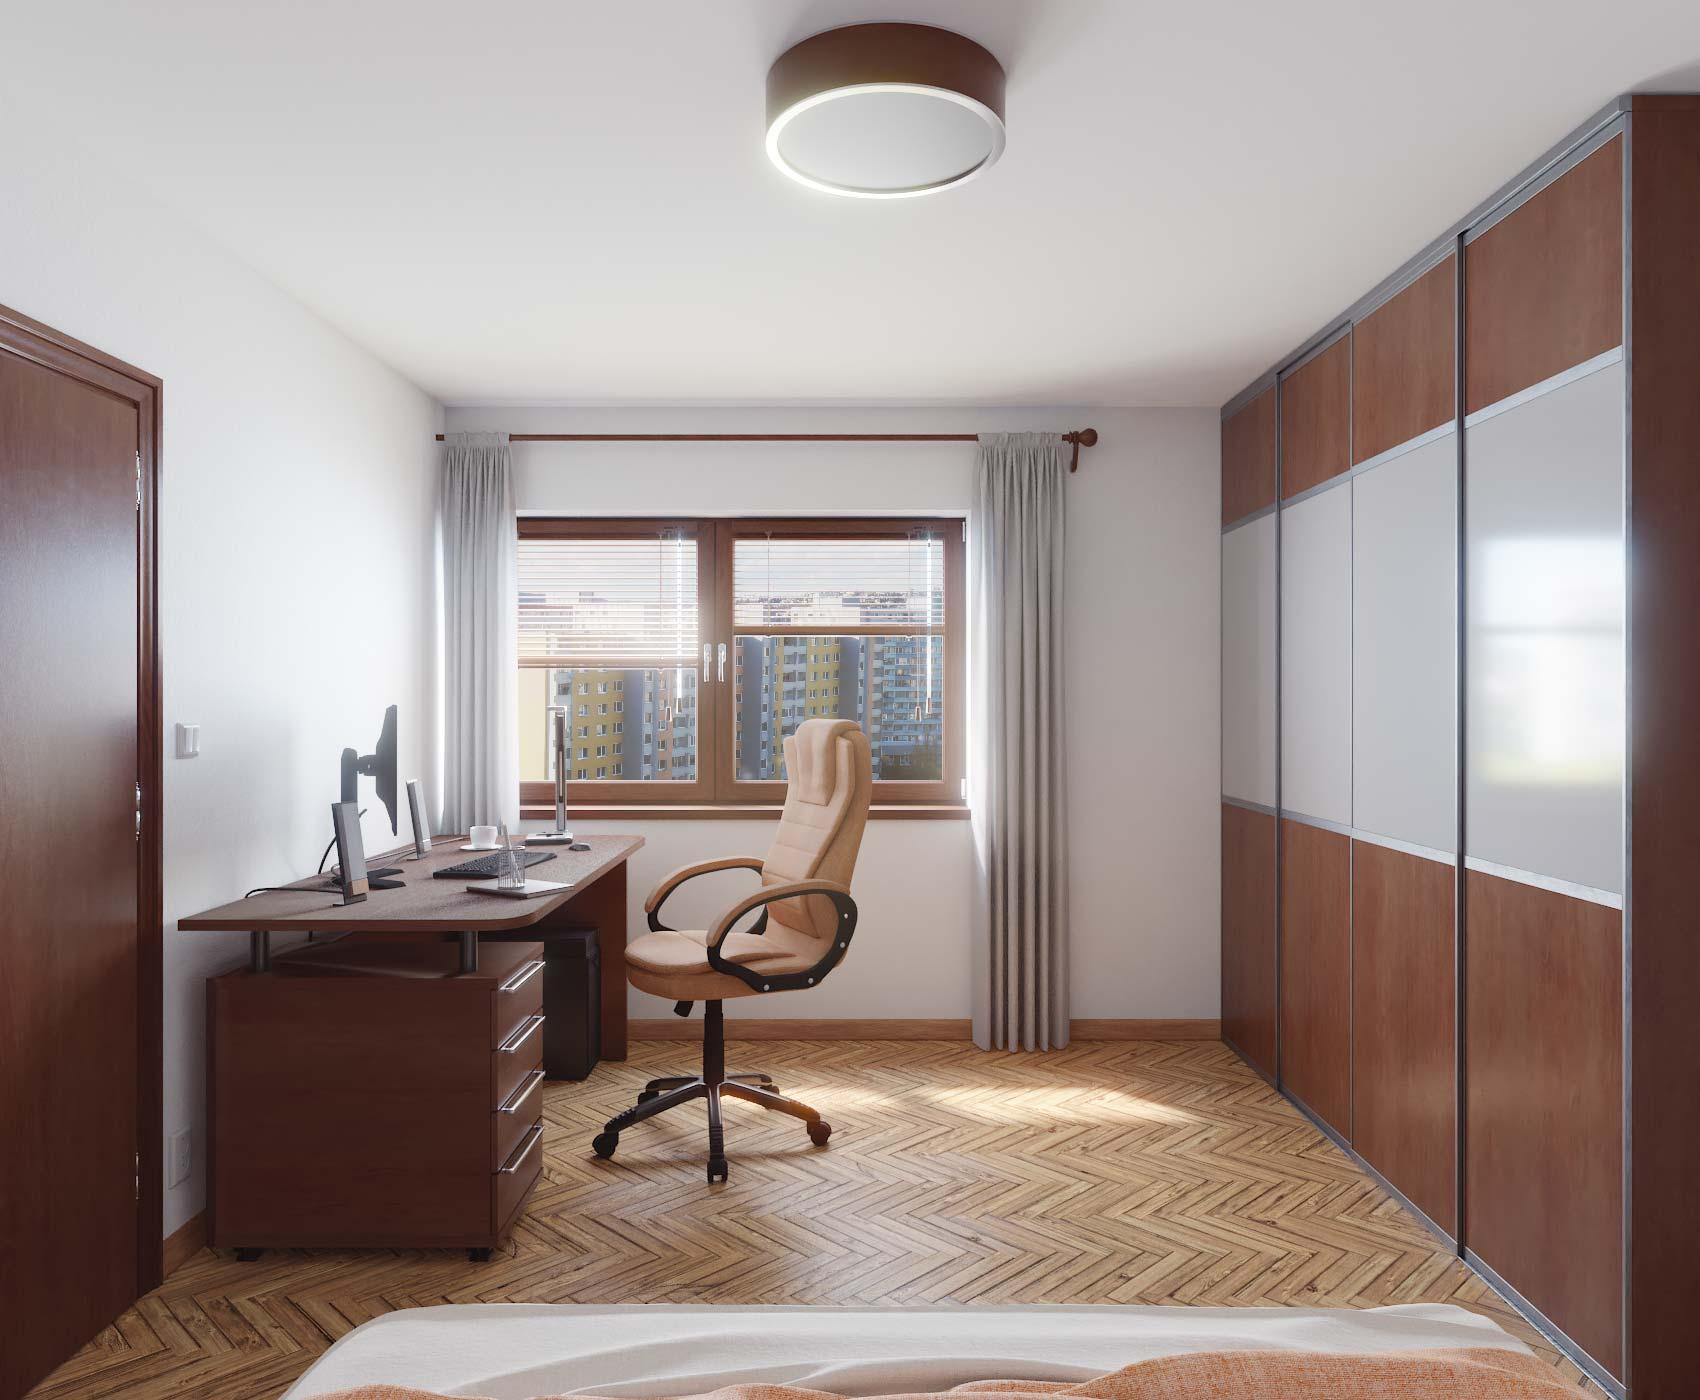 idea3d - vizualizácia spálňa 1